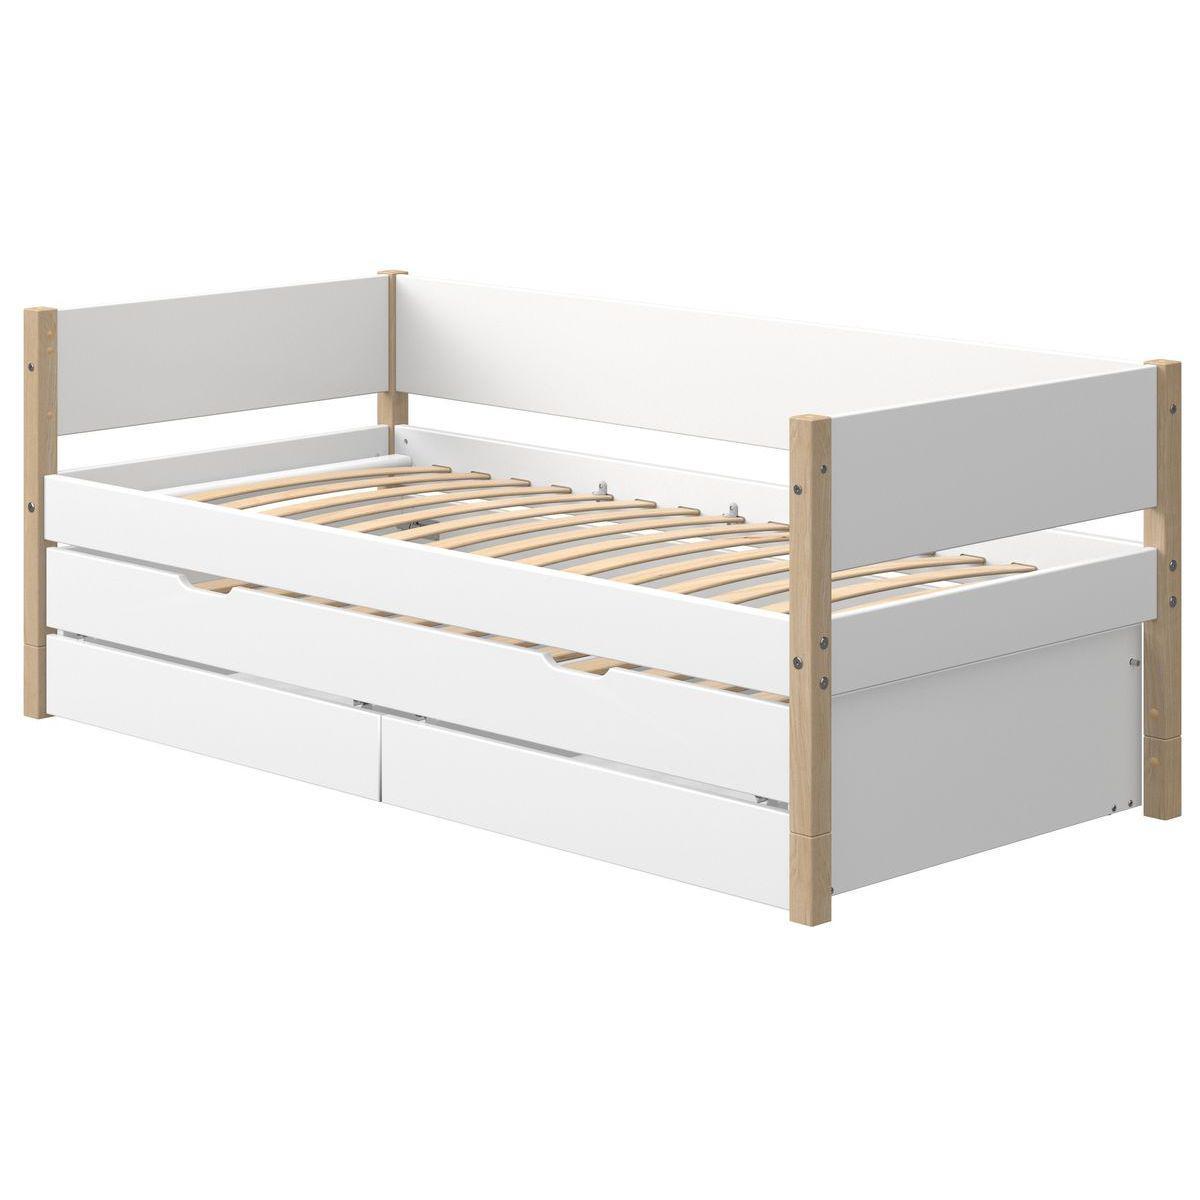 Cama-sofá 90x200cm cama nido-2 cajones NOR Flexa roble-blanco